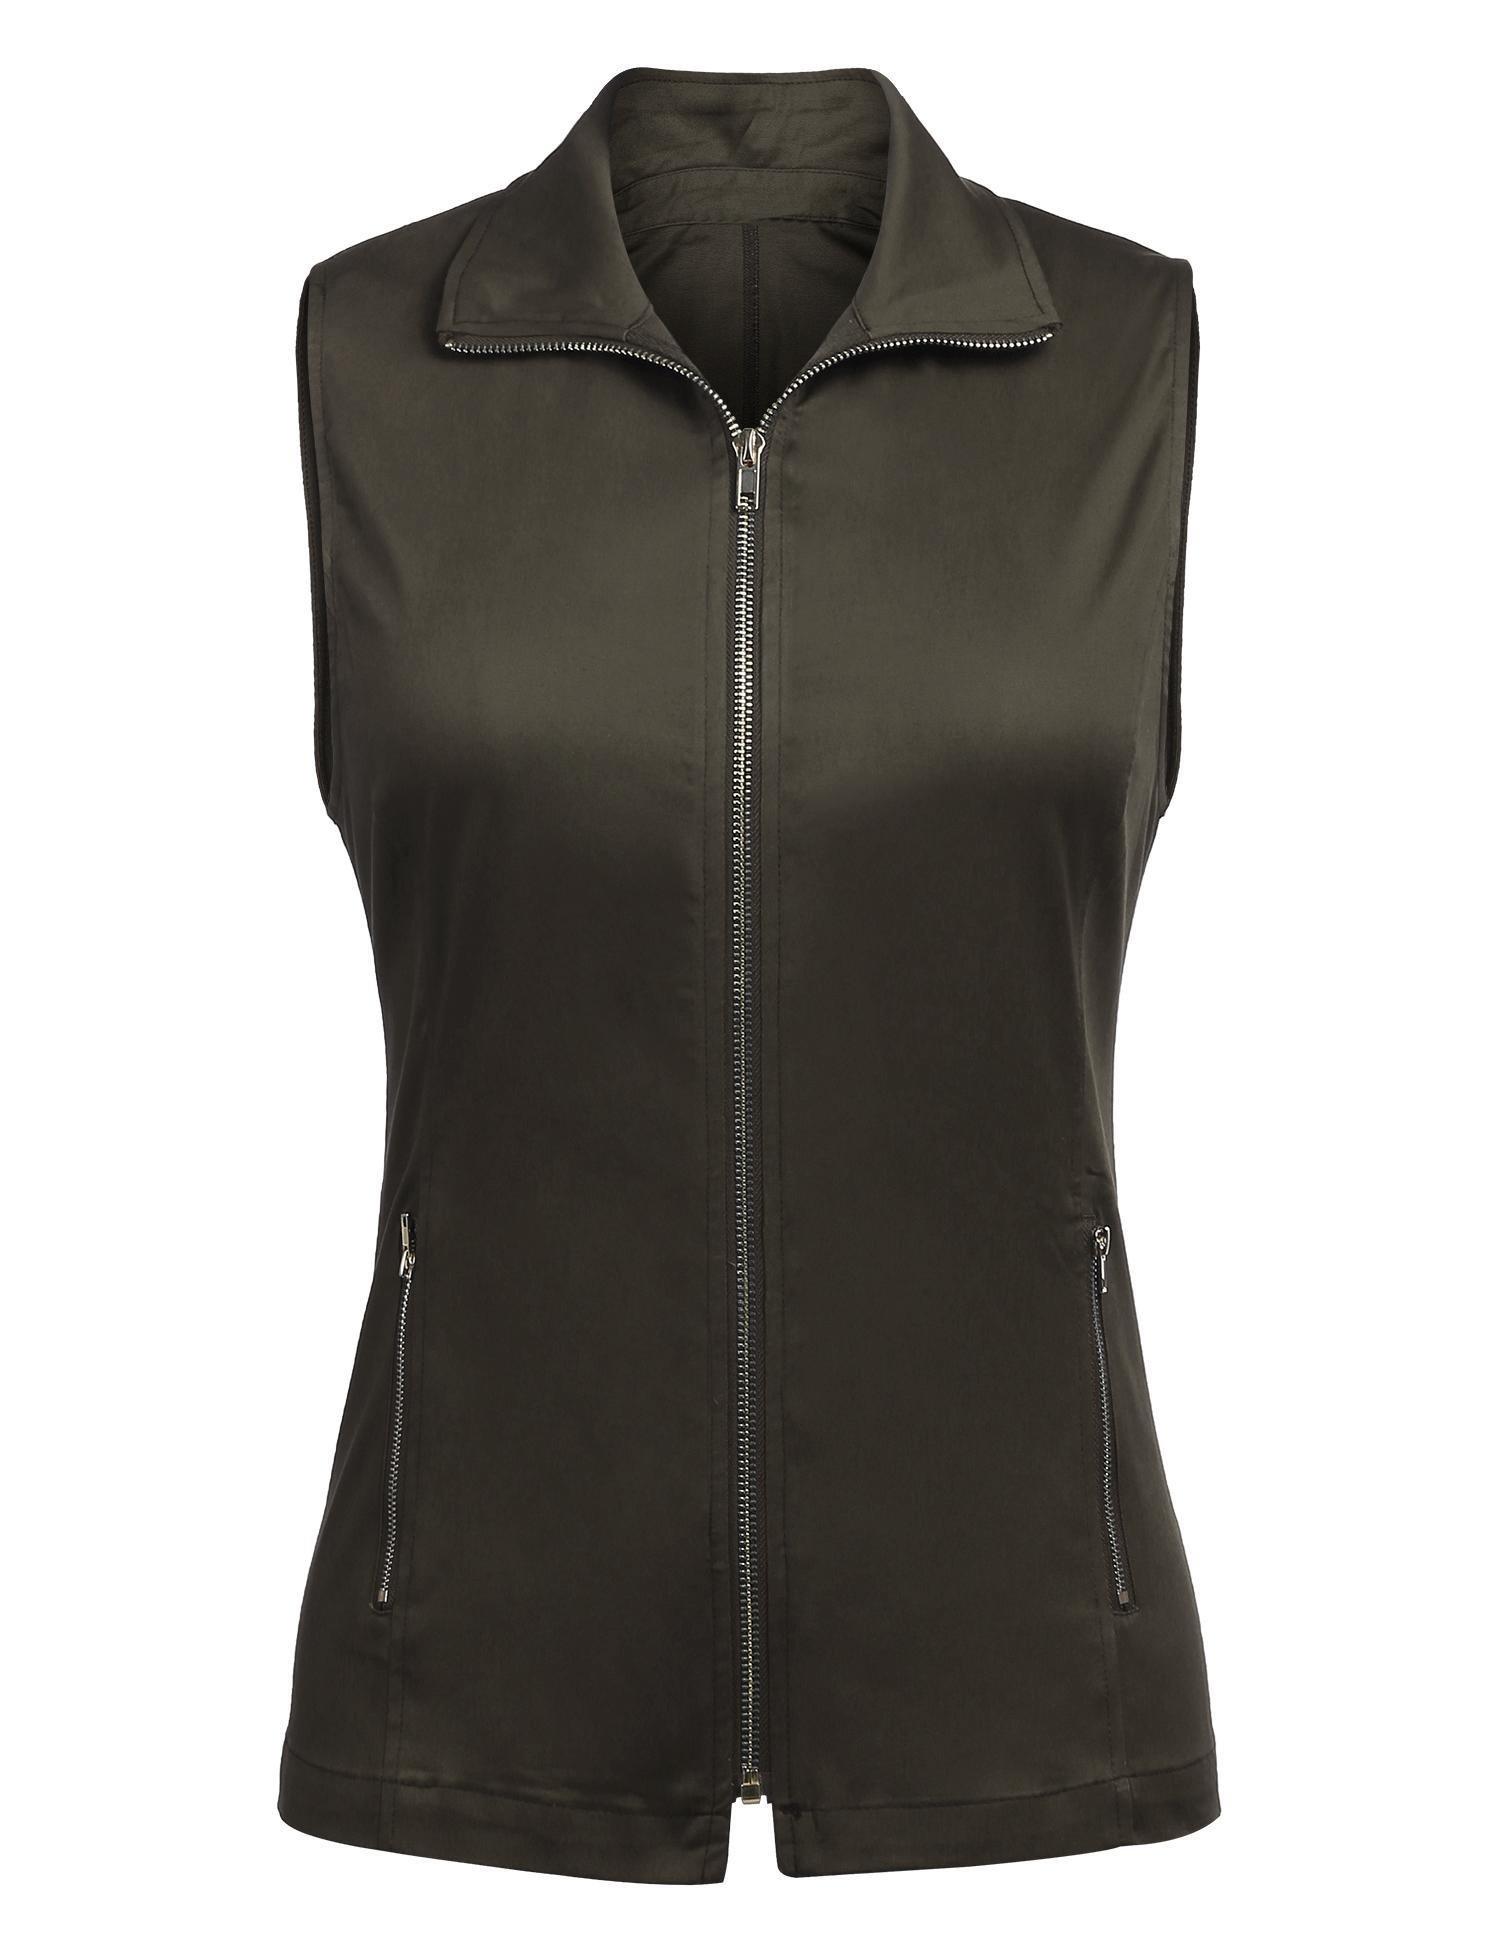 Dealwell Women's Outdoor Lightweight Sleeveless Military Jacket Vest With Zipper (Army Green L) by Dealwell